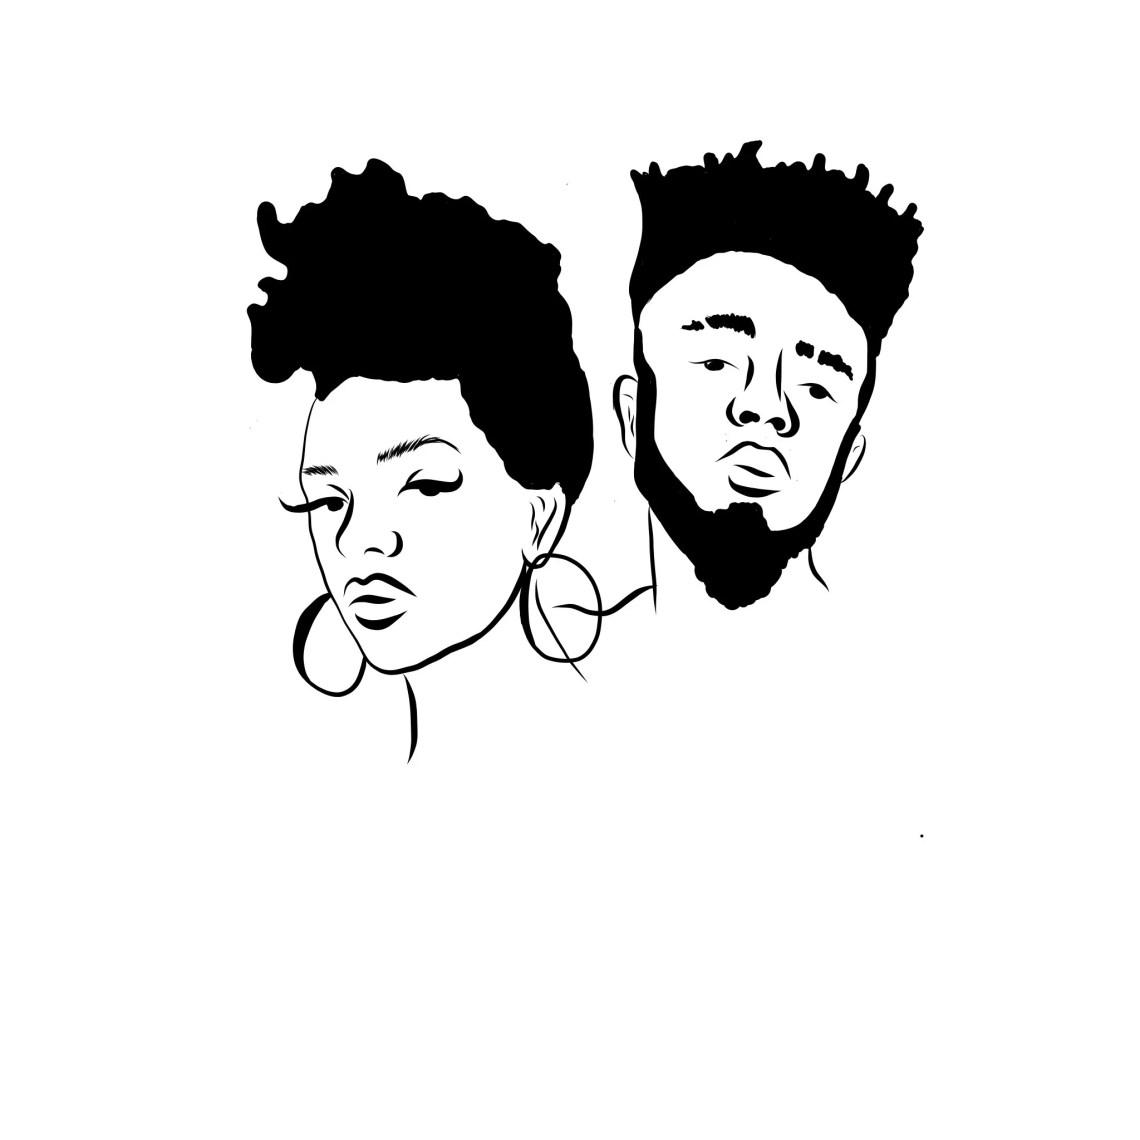 Download Black Couple Love Relationships Black Woman Black Man SVG ...